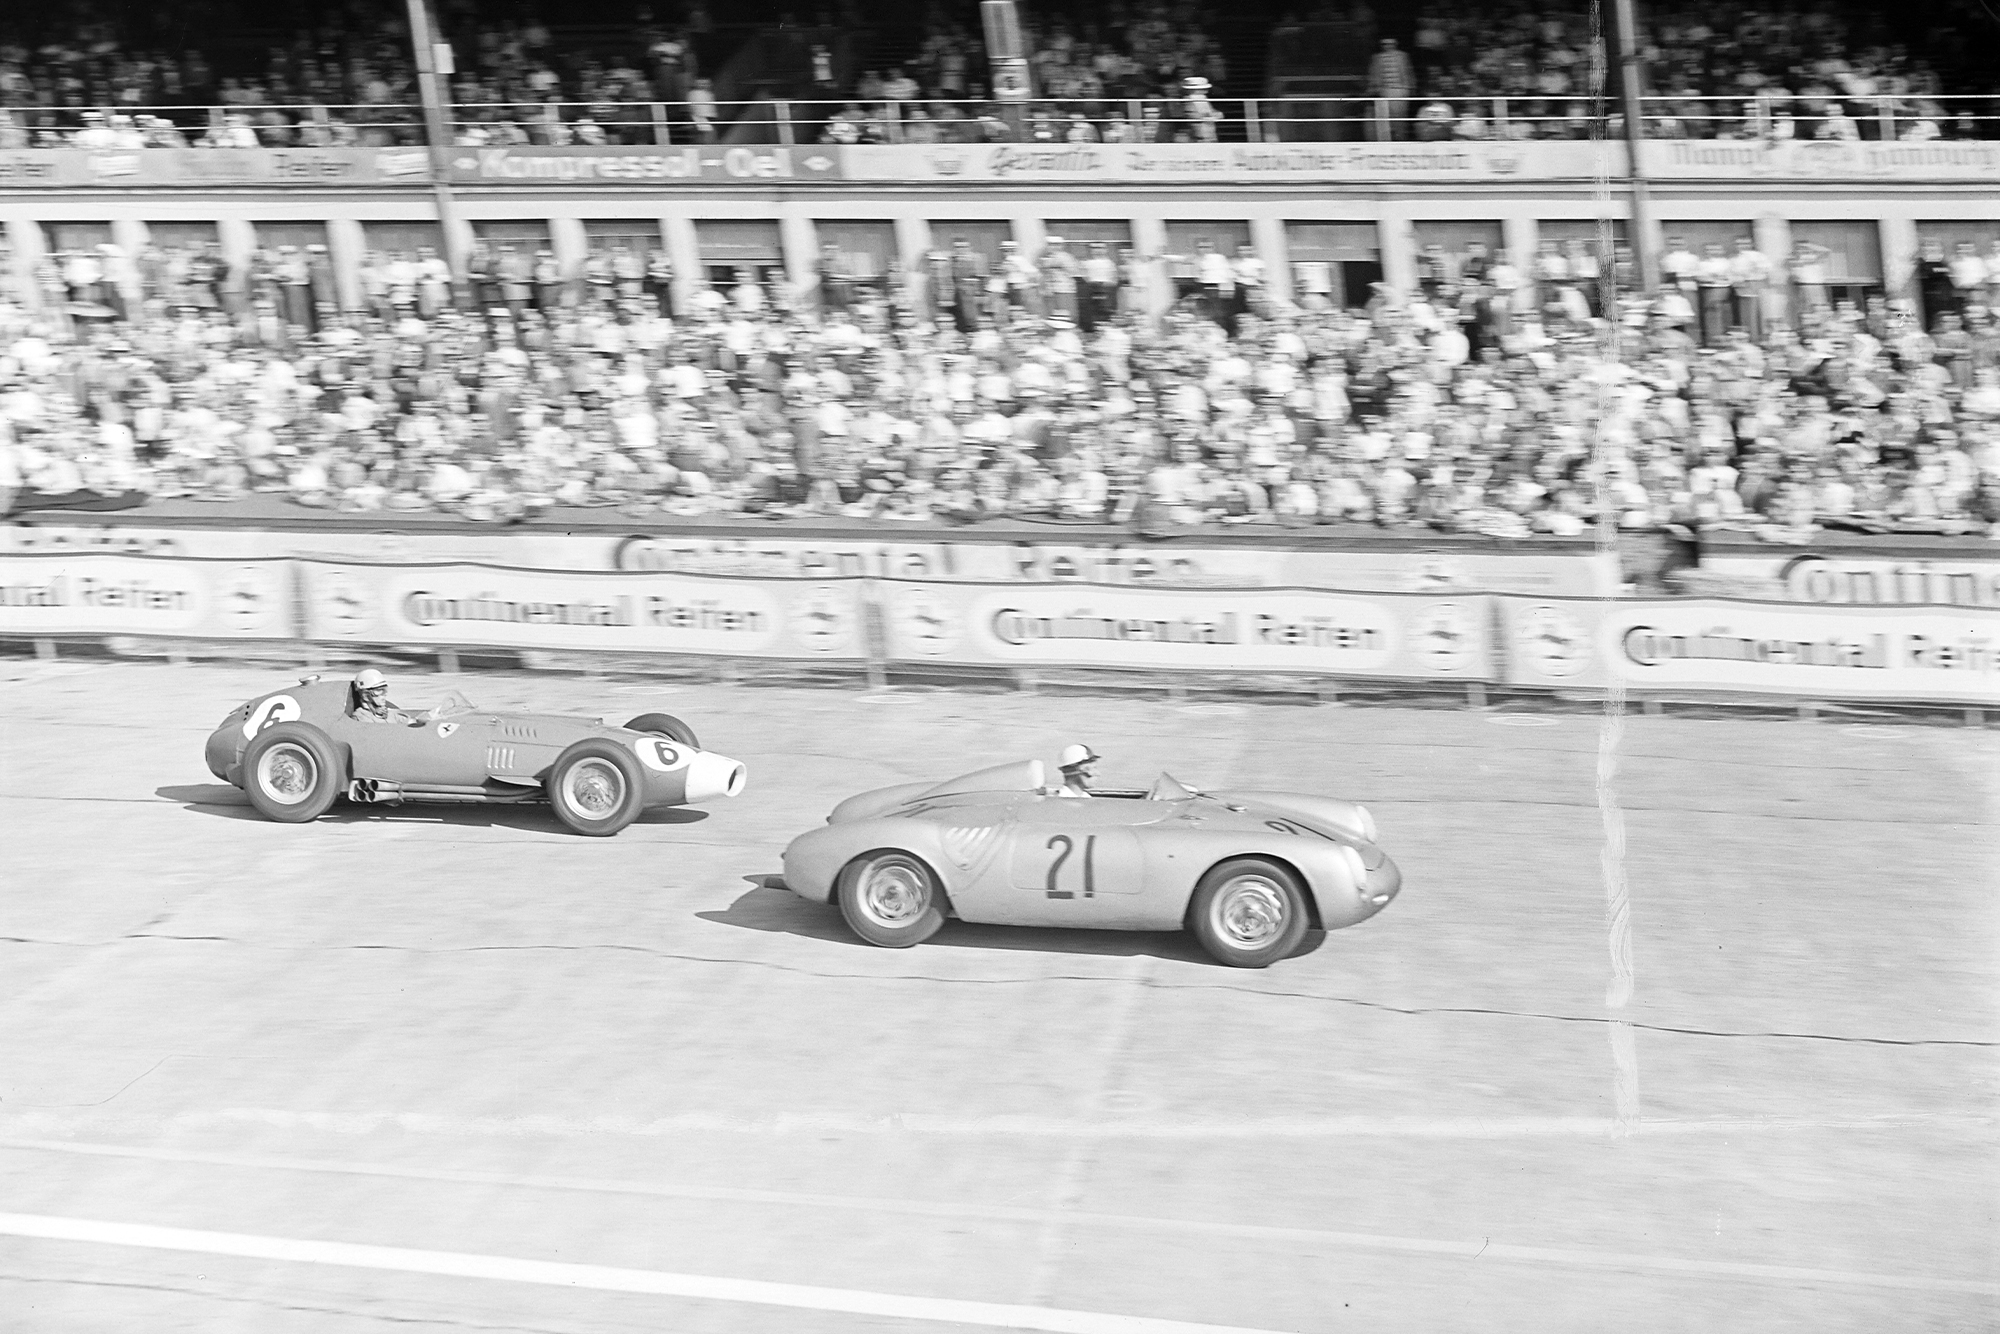 Edgar Barth, Porsche 550RS, leads Luigi Musso, Ferrari D50, during the 1957 German Grand Prix, Nurburgring.